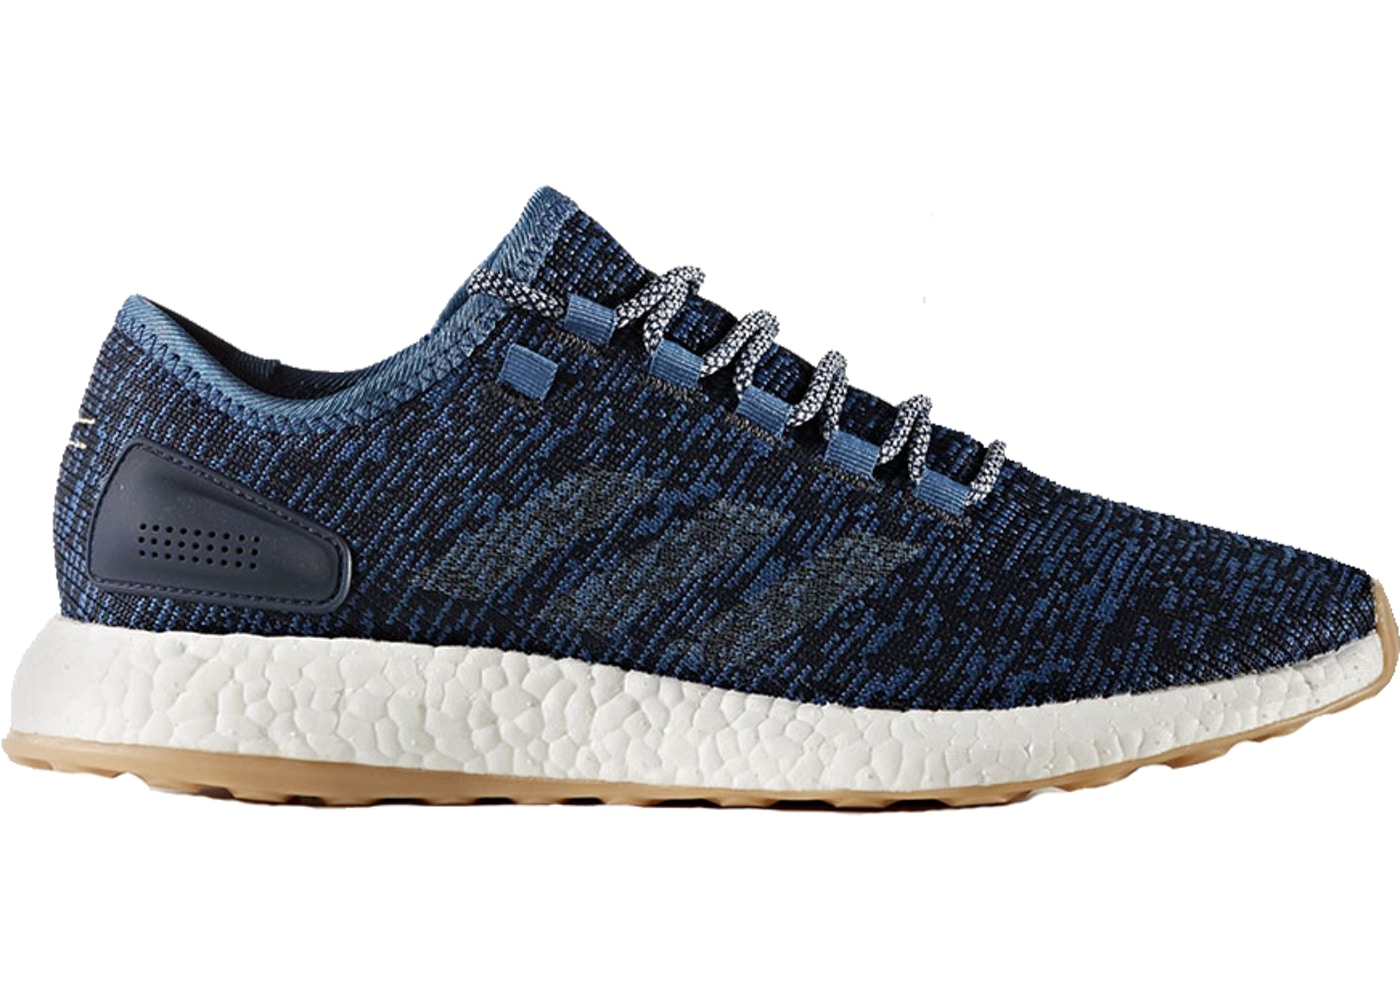 5a5987fdd7b97 ... adidas Pureboost 2017 Core Blue . ...